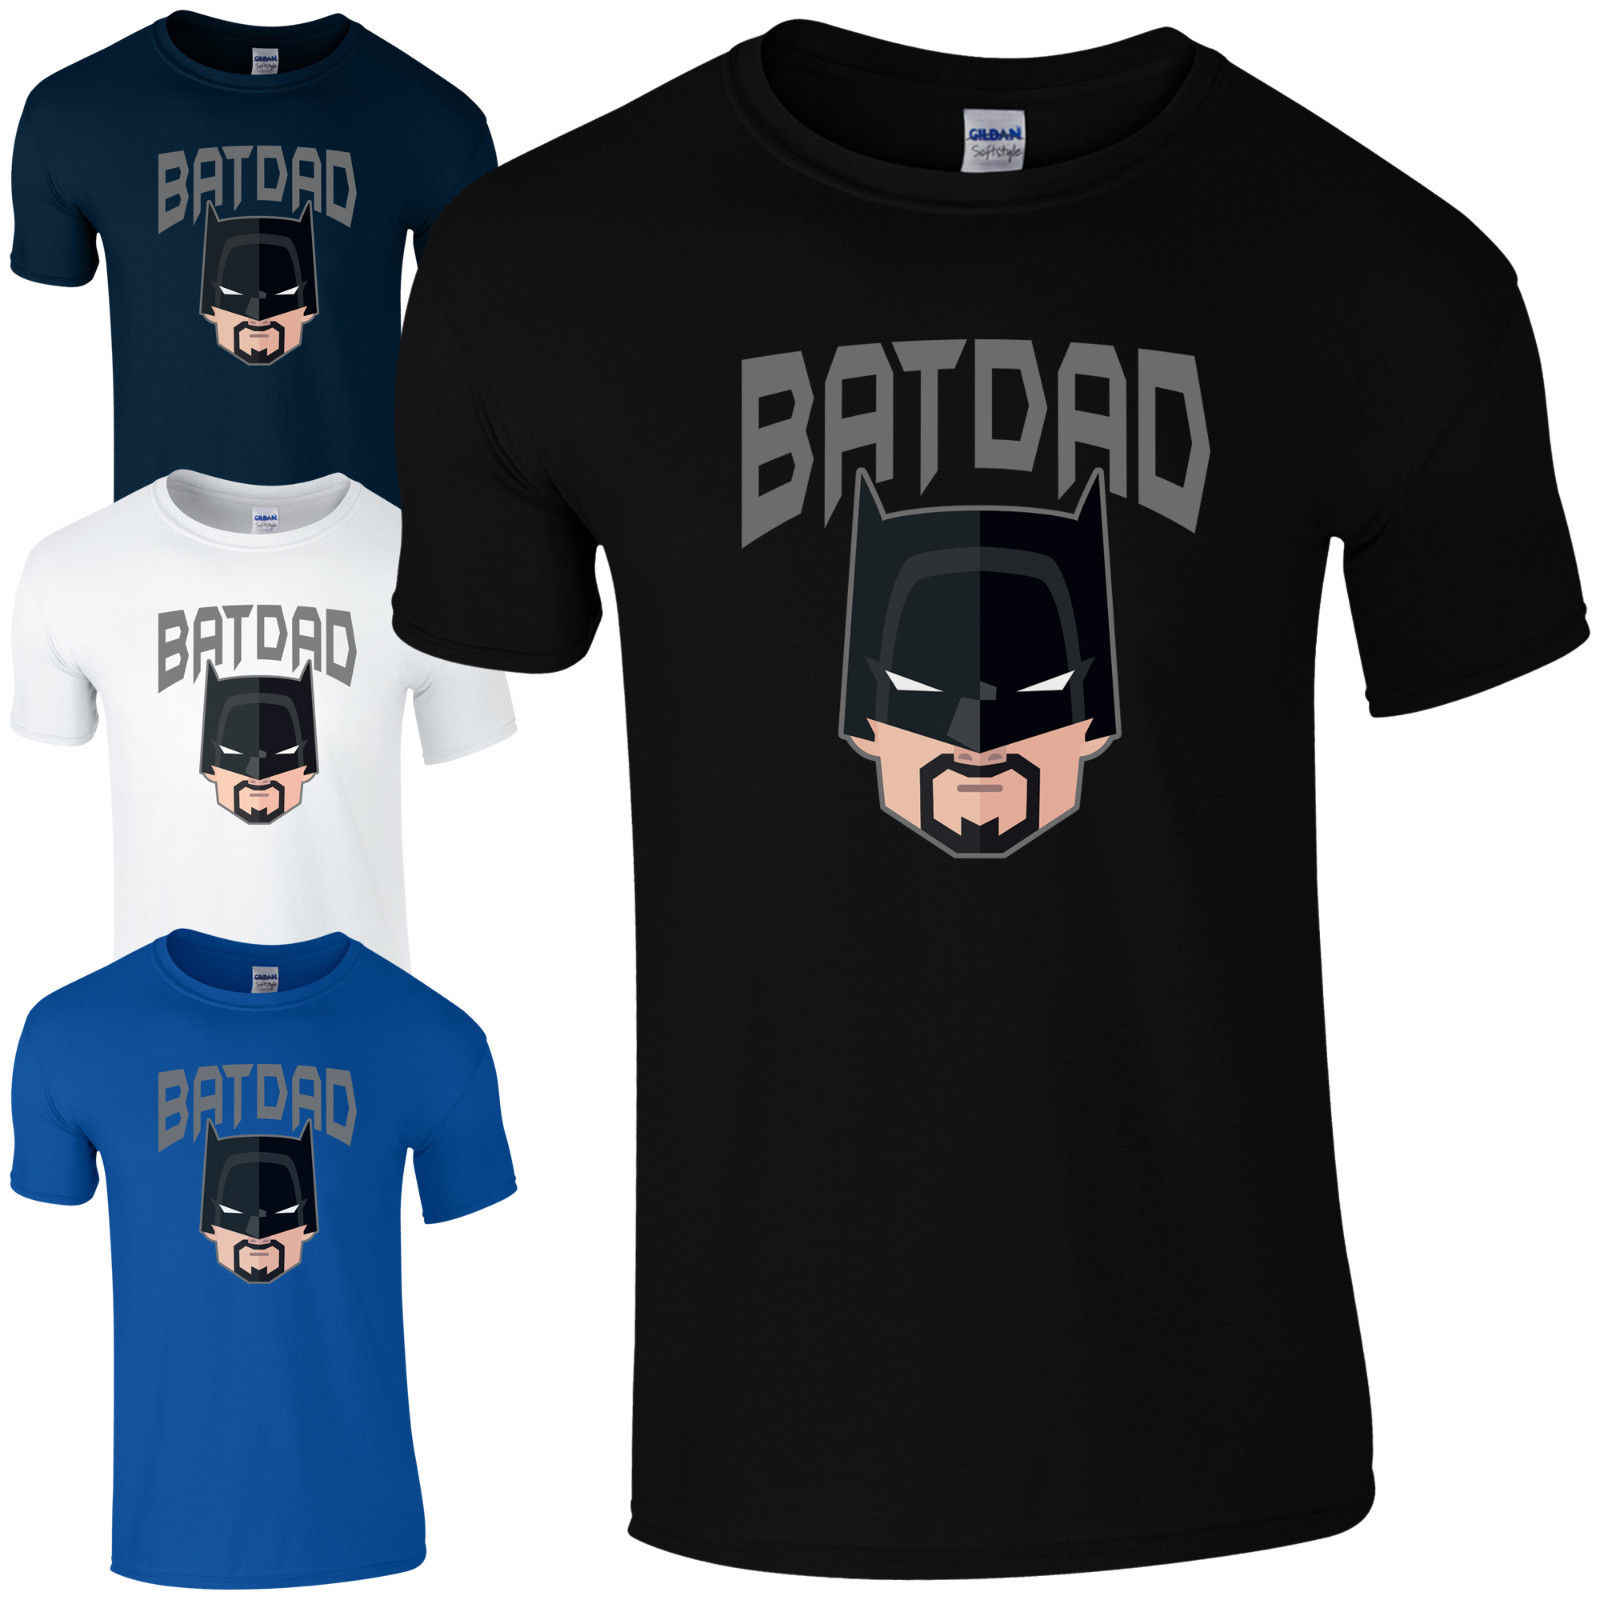 Batdad T-Shirt - Funny Batman Bat Dad Fathers Day Gift Birthday Present Mens Top